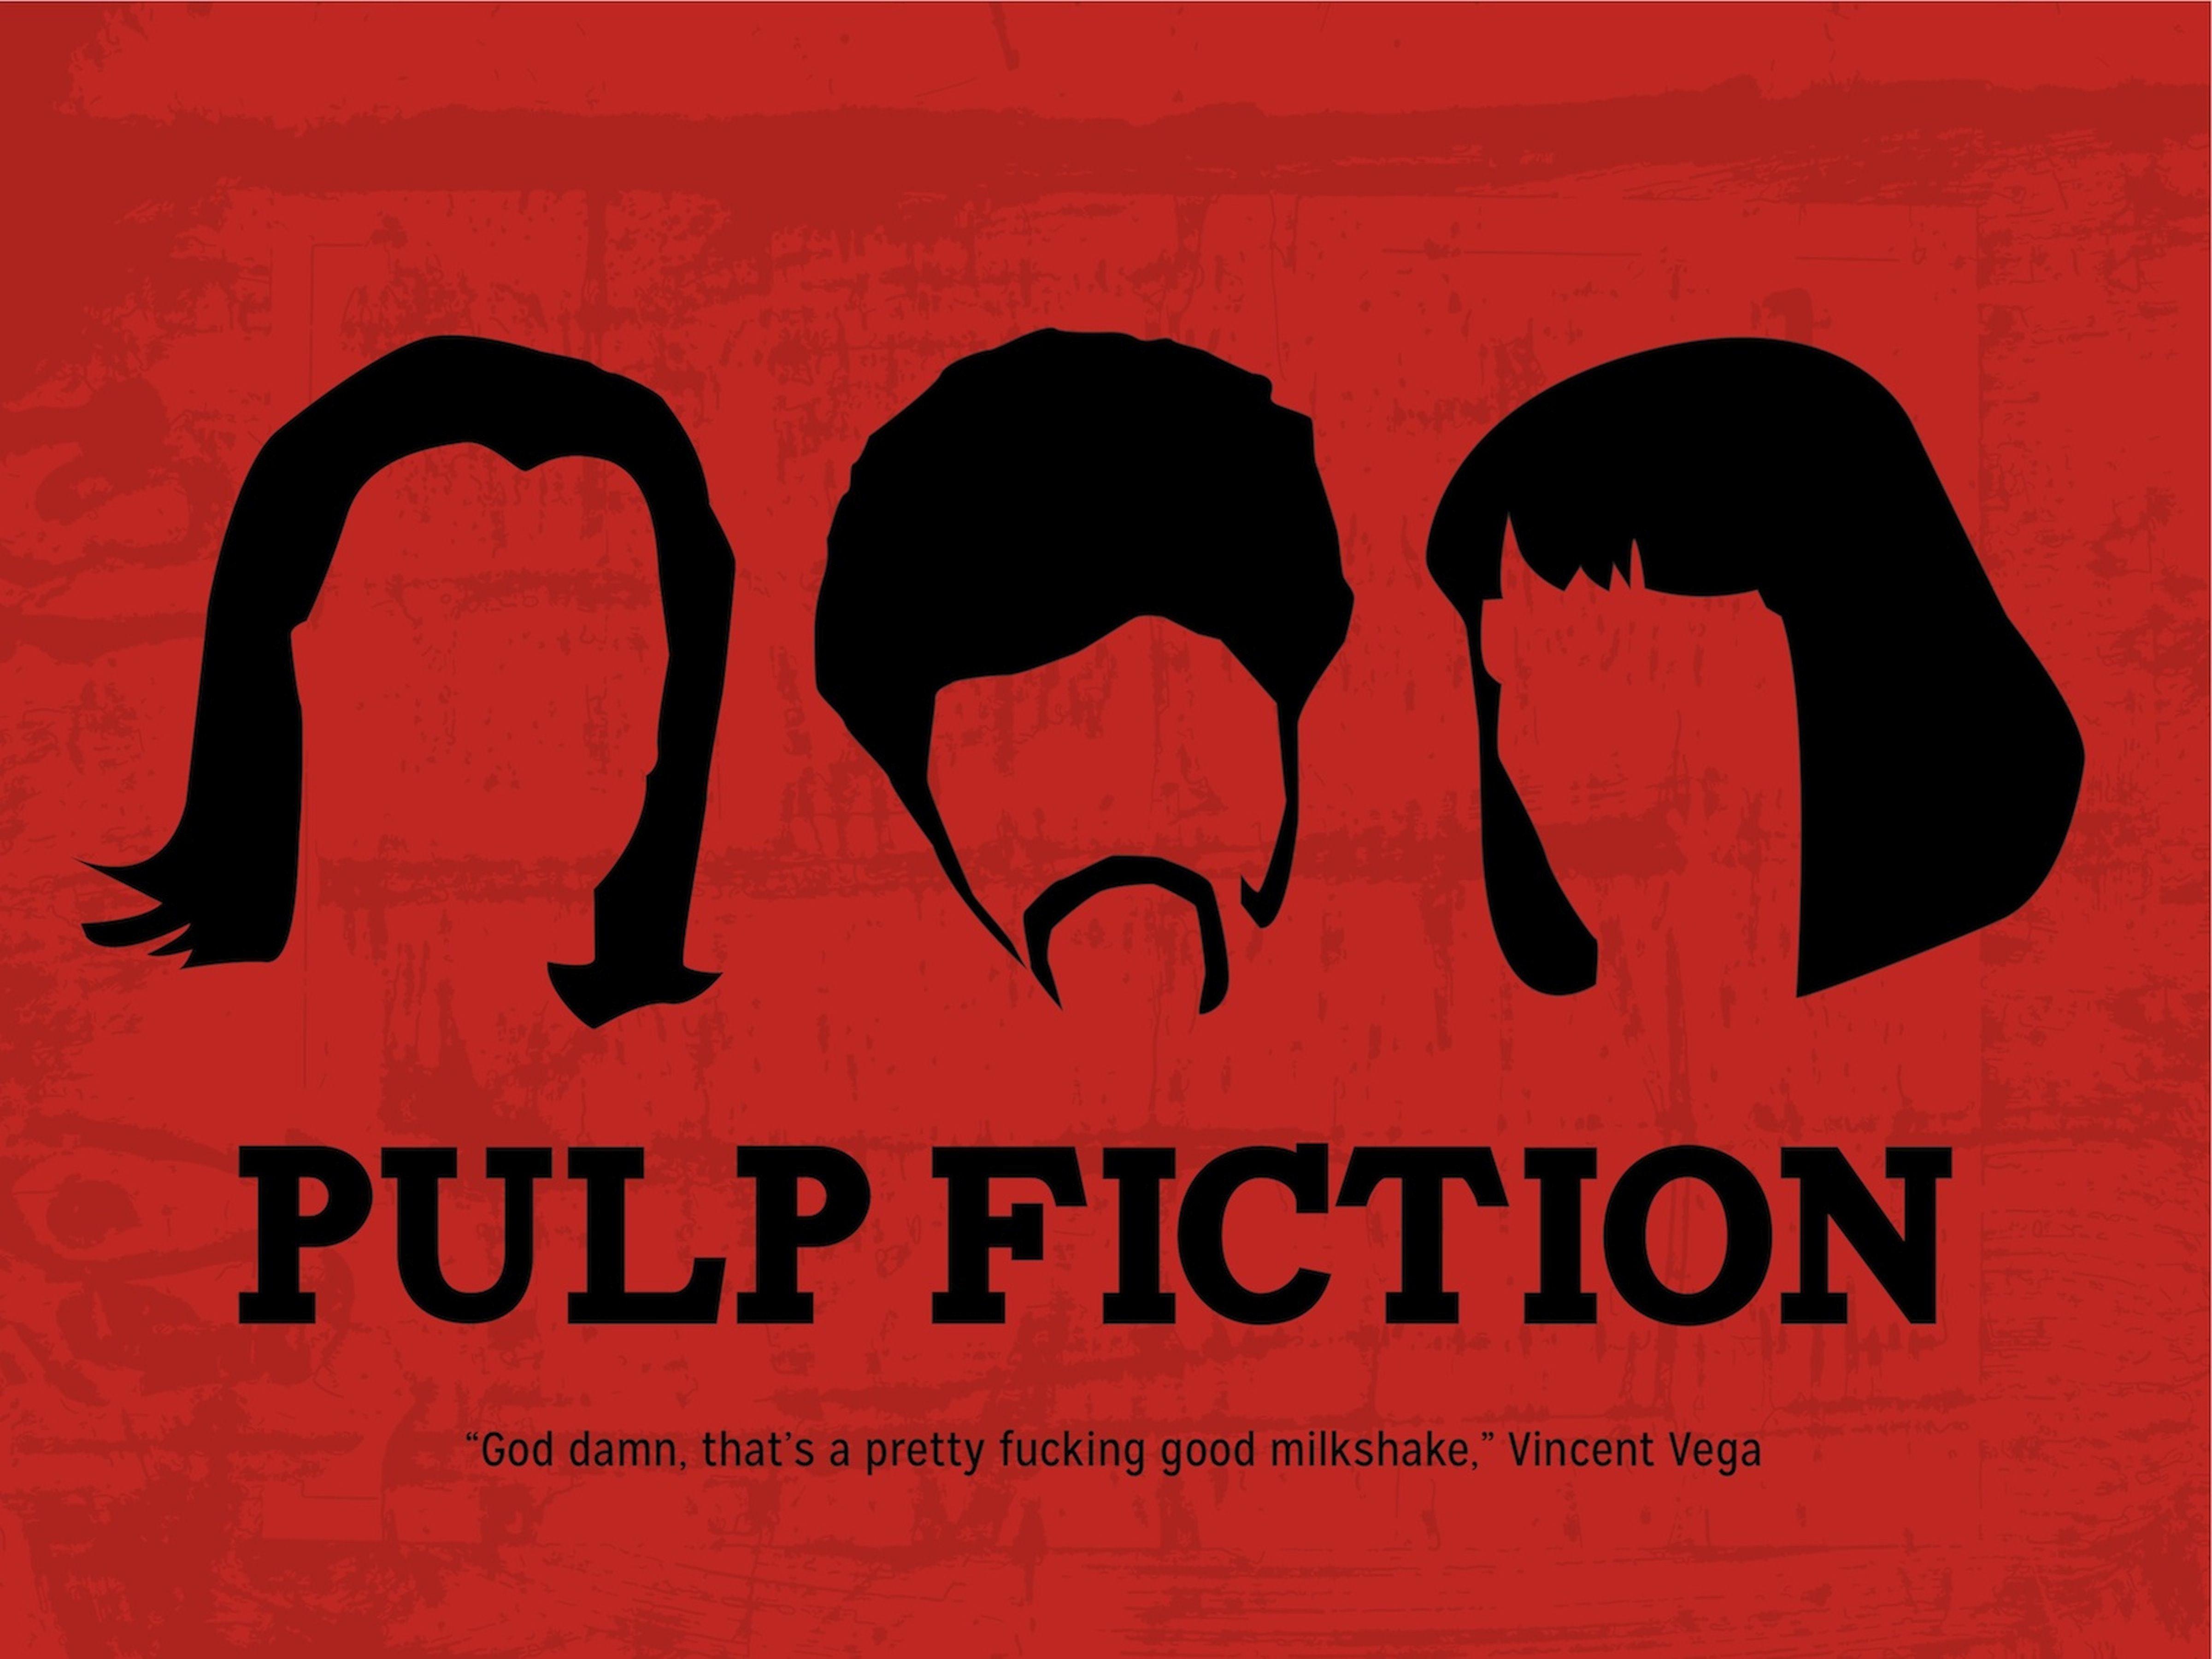 Pulp Fiction Pictures Free For Desktop